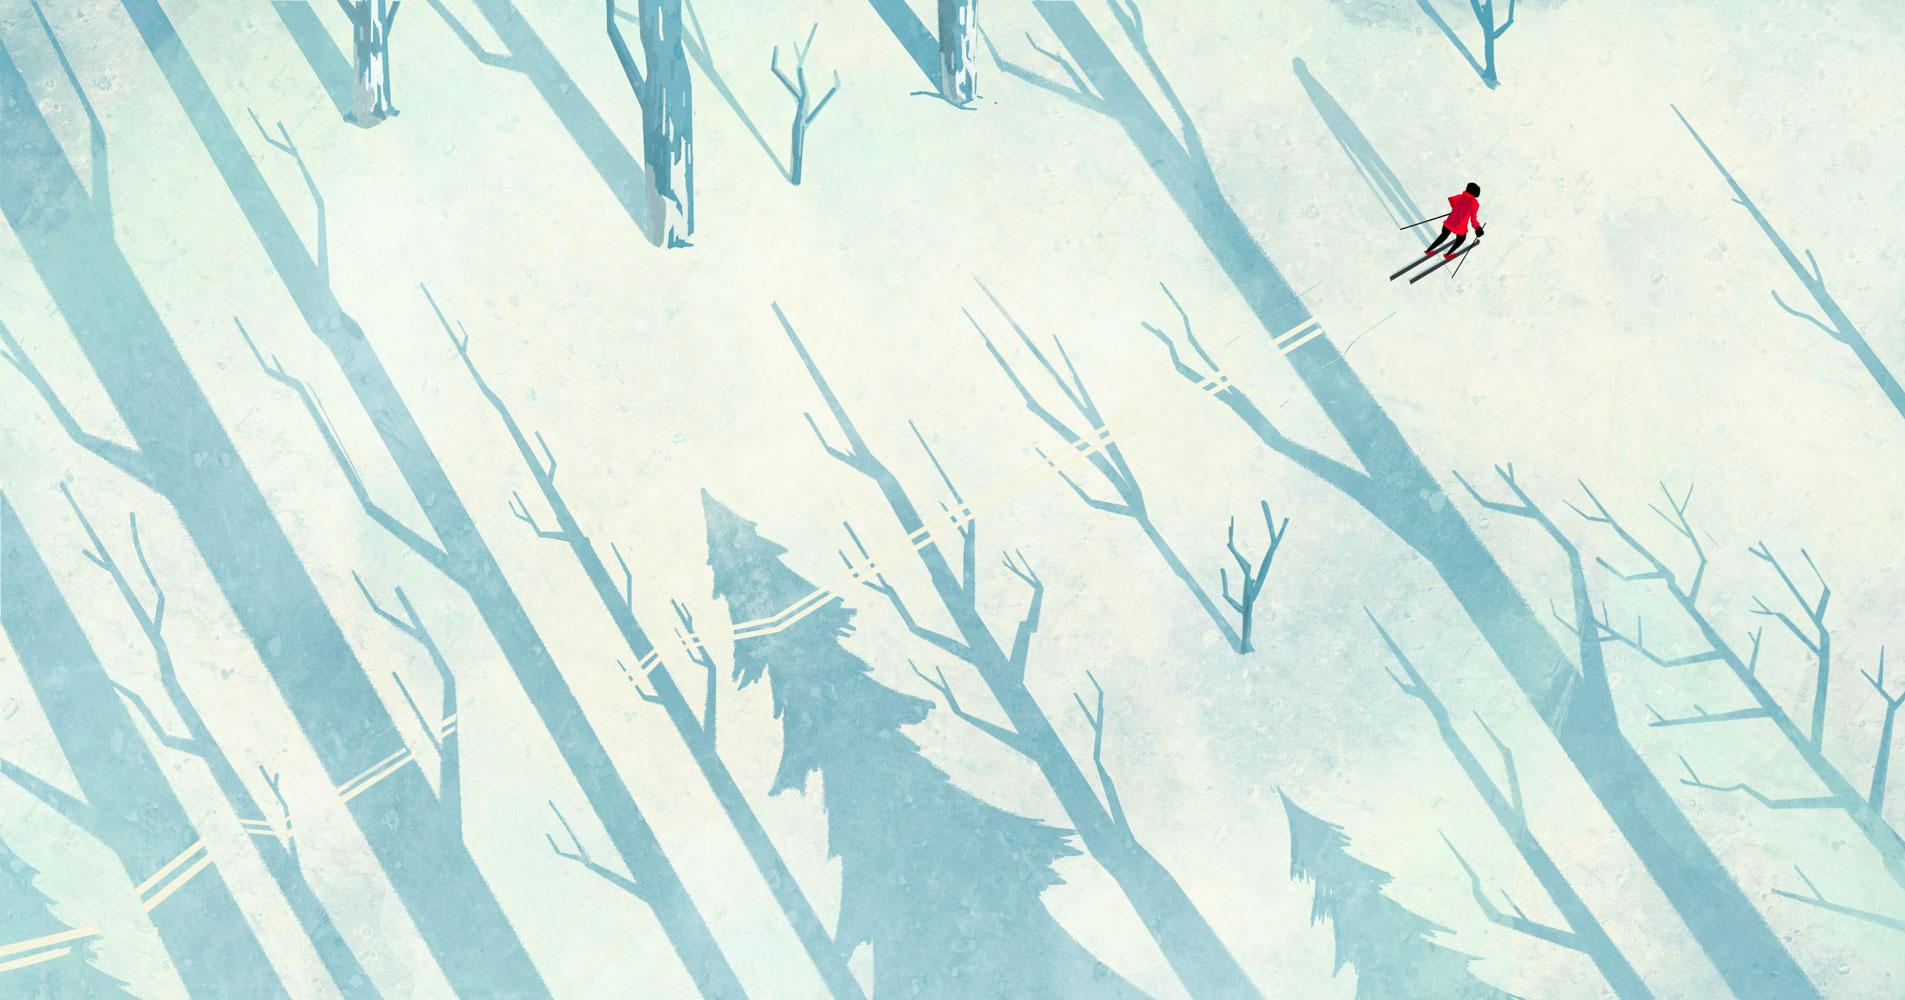 Jarred Briggs Winter calm illustration